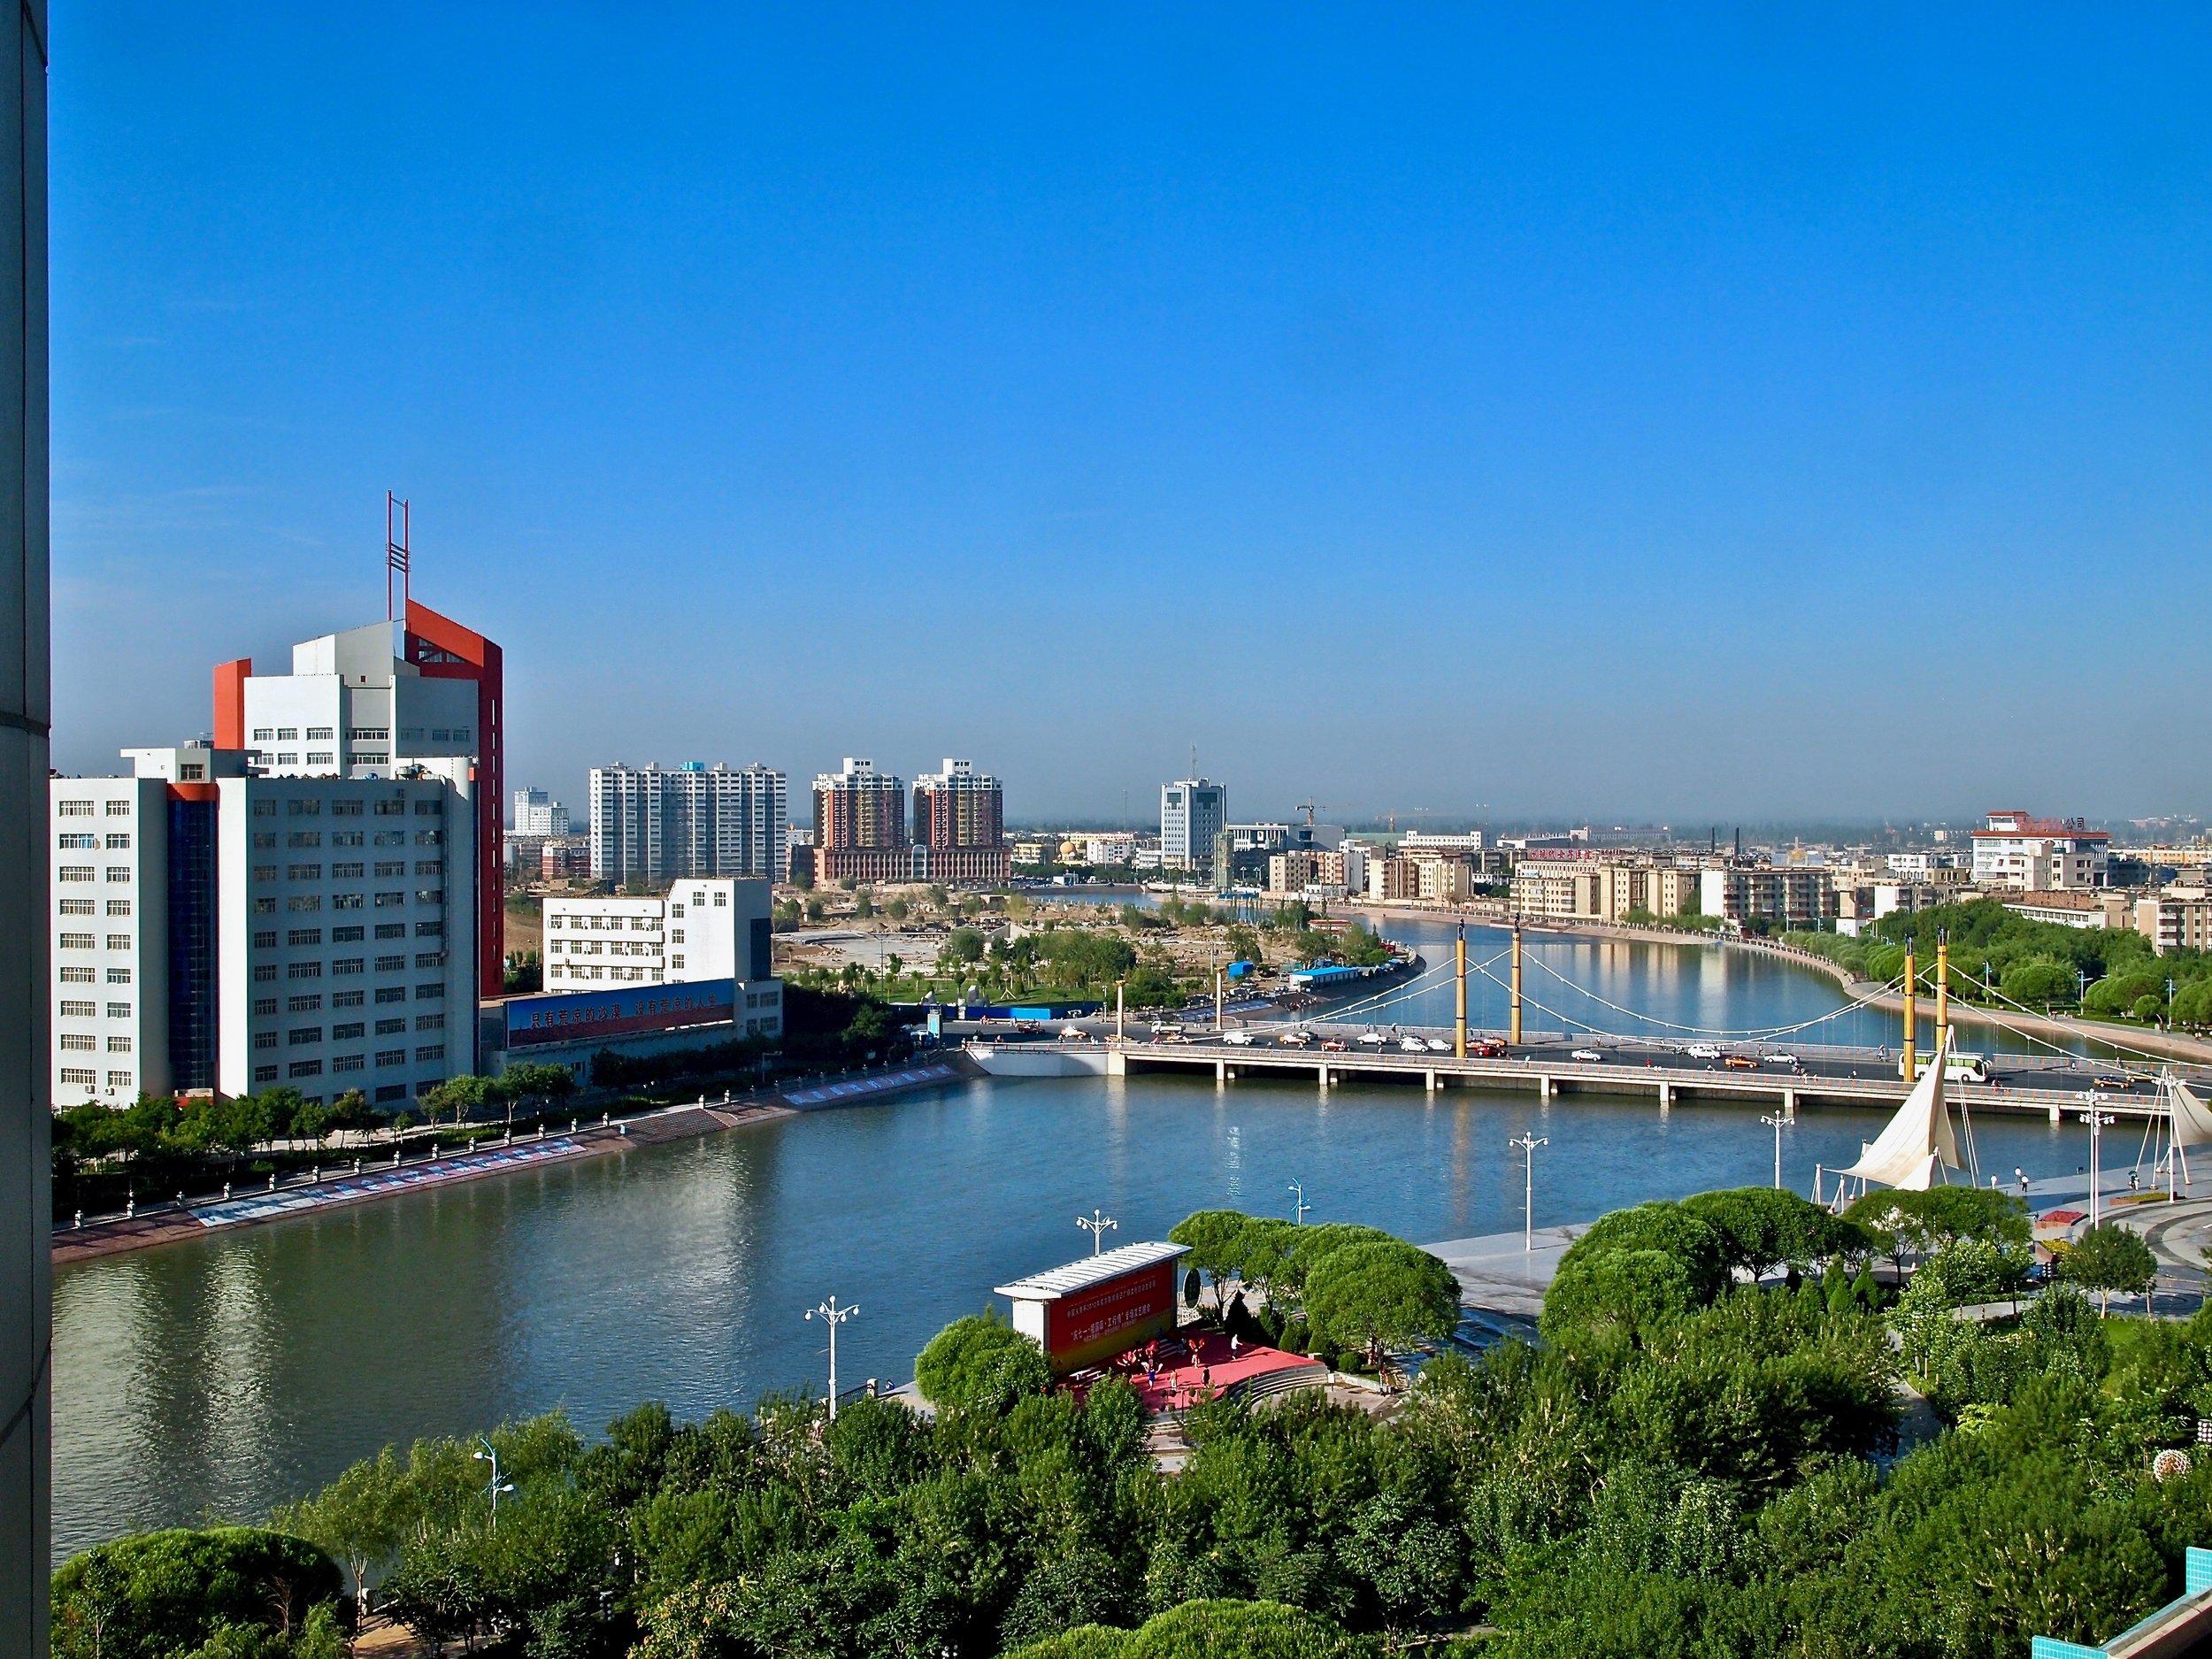 Korla, Xinjiang, China. (C) Remko Tanis